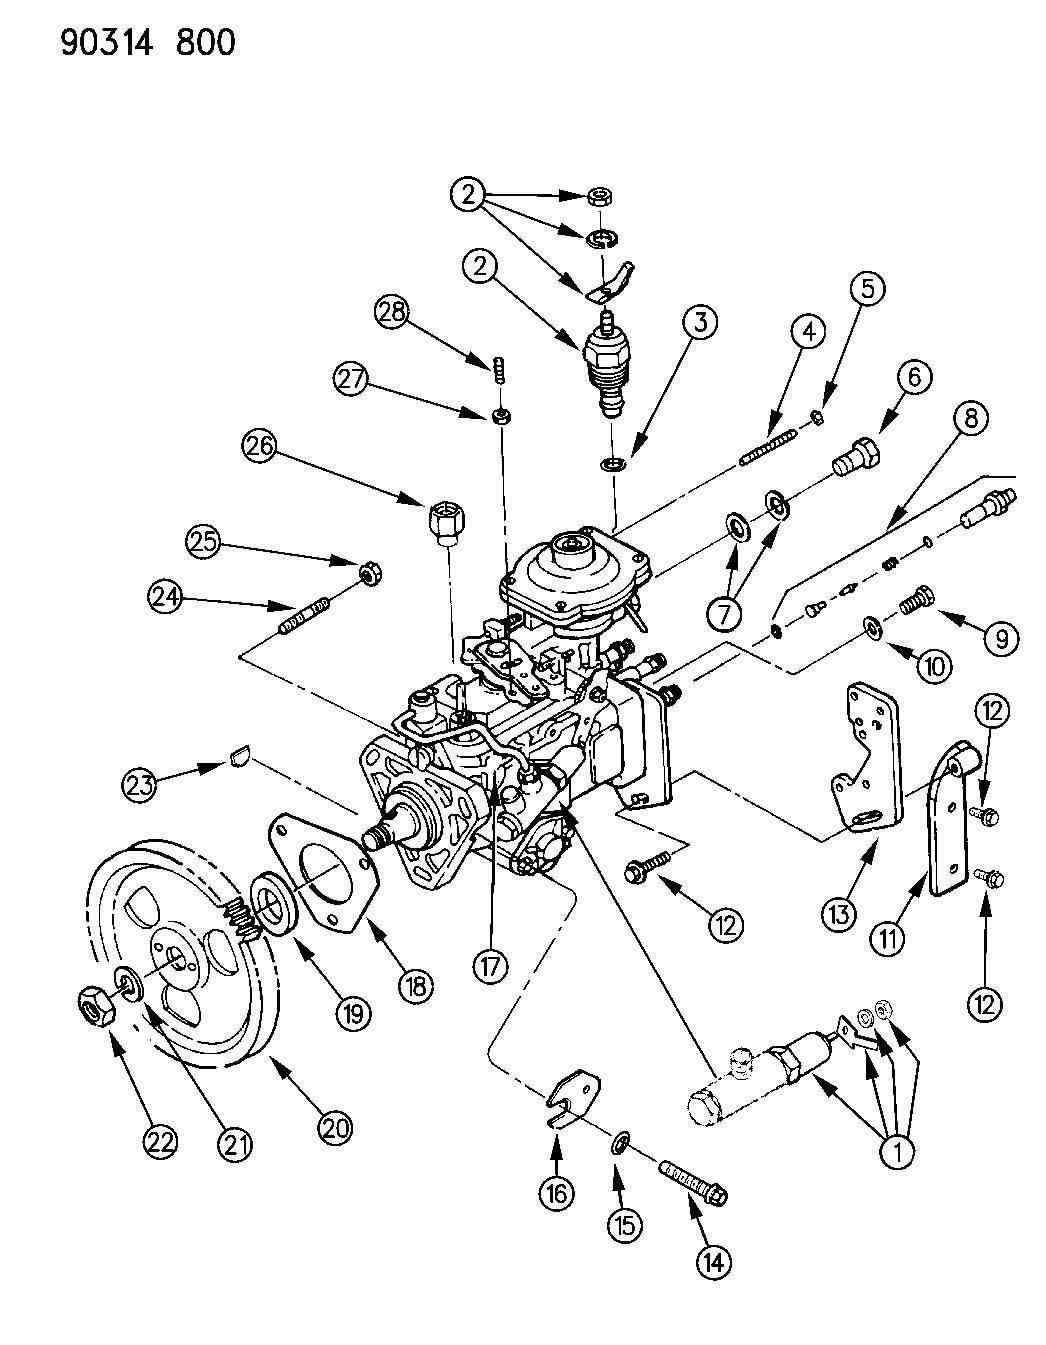 Dodge Ram 1500 Washer. Fuel line banjo. Dieselengine